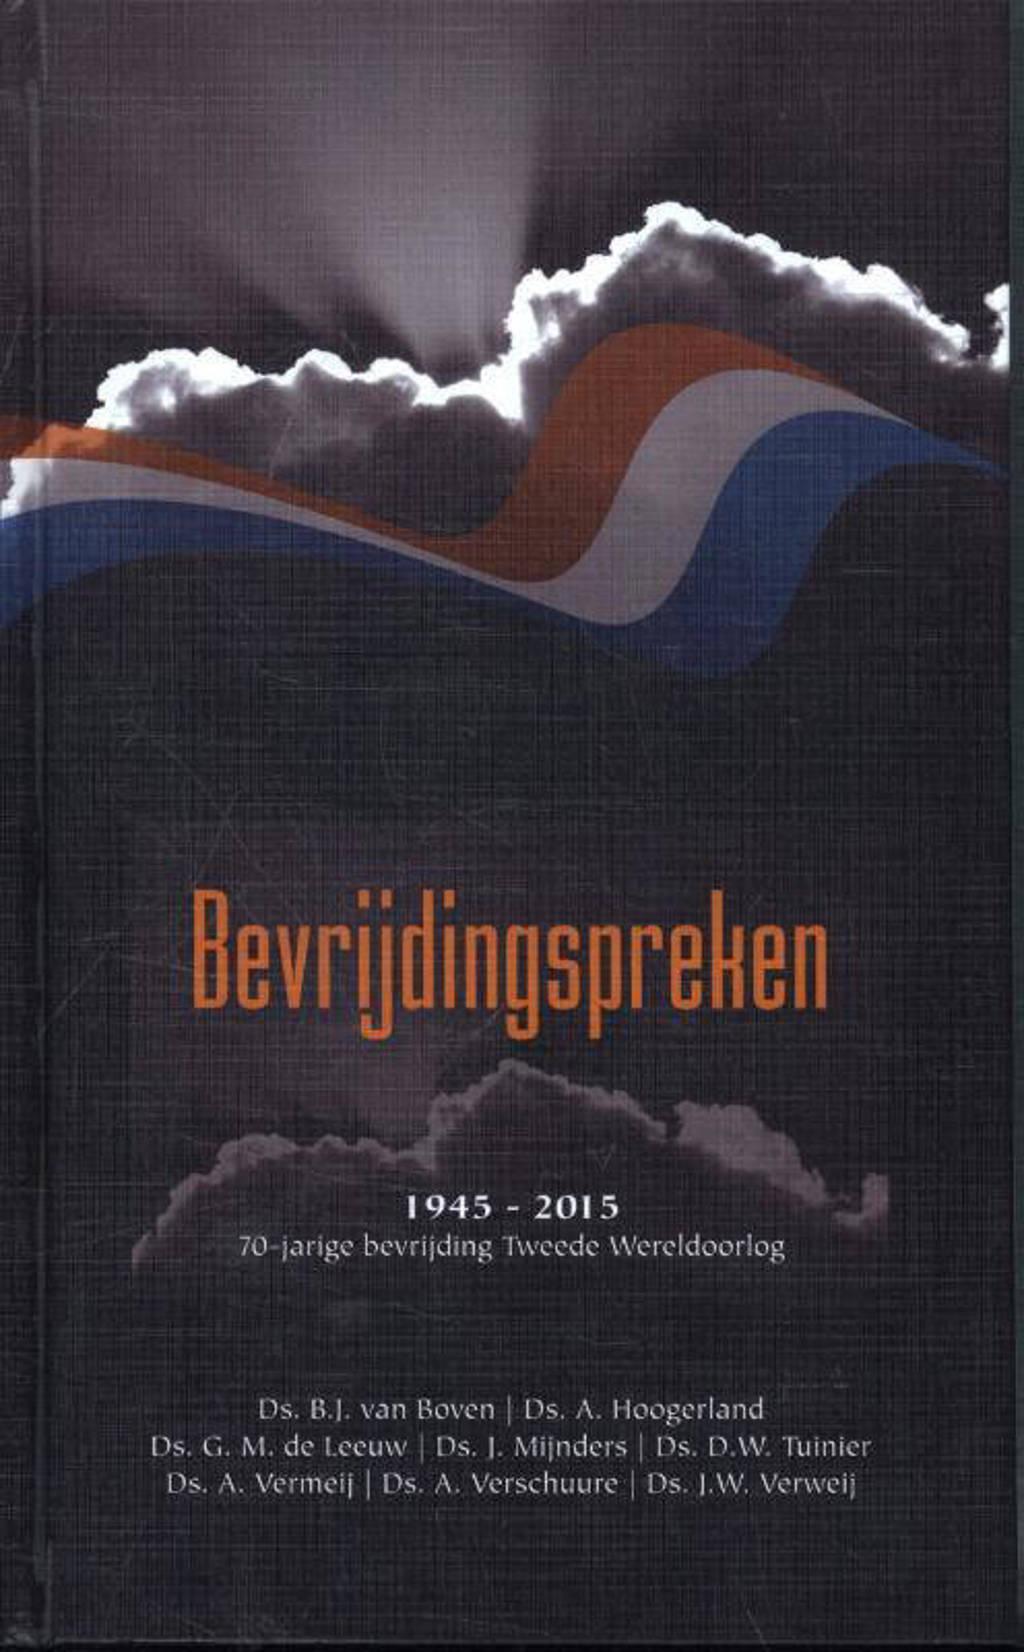 Bevrijdingspreken - B.J. van Boven, A. Hoogerland, J. Mijnders, e.a.